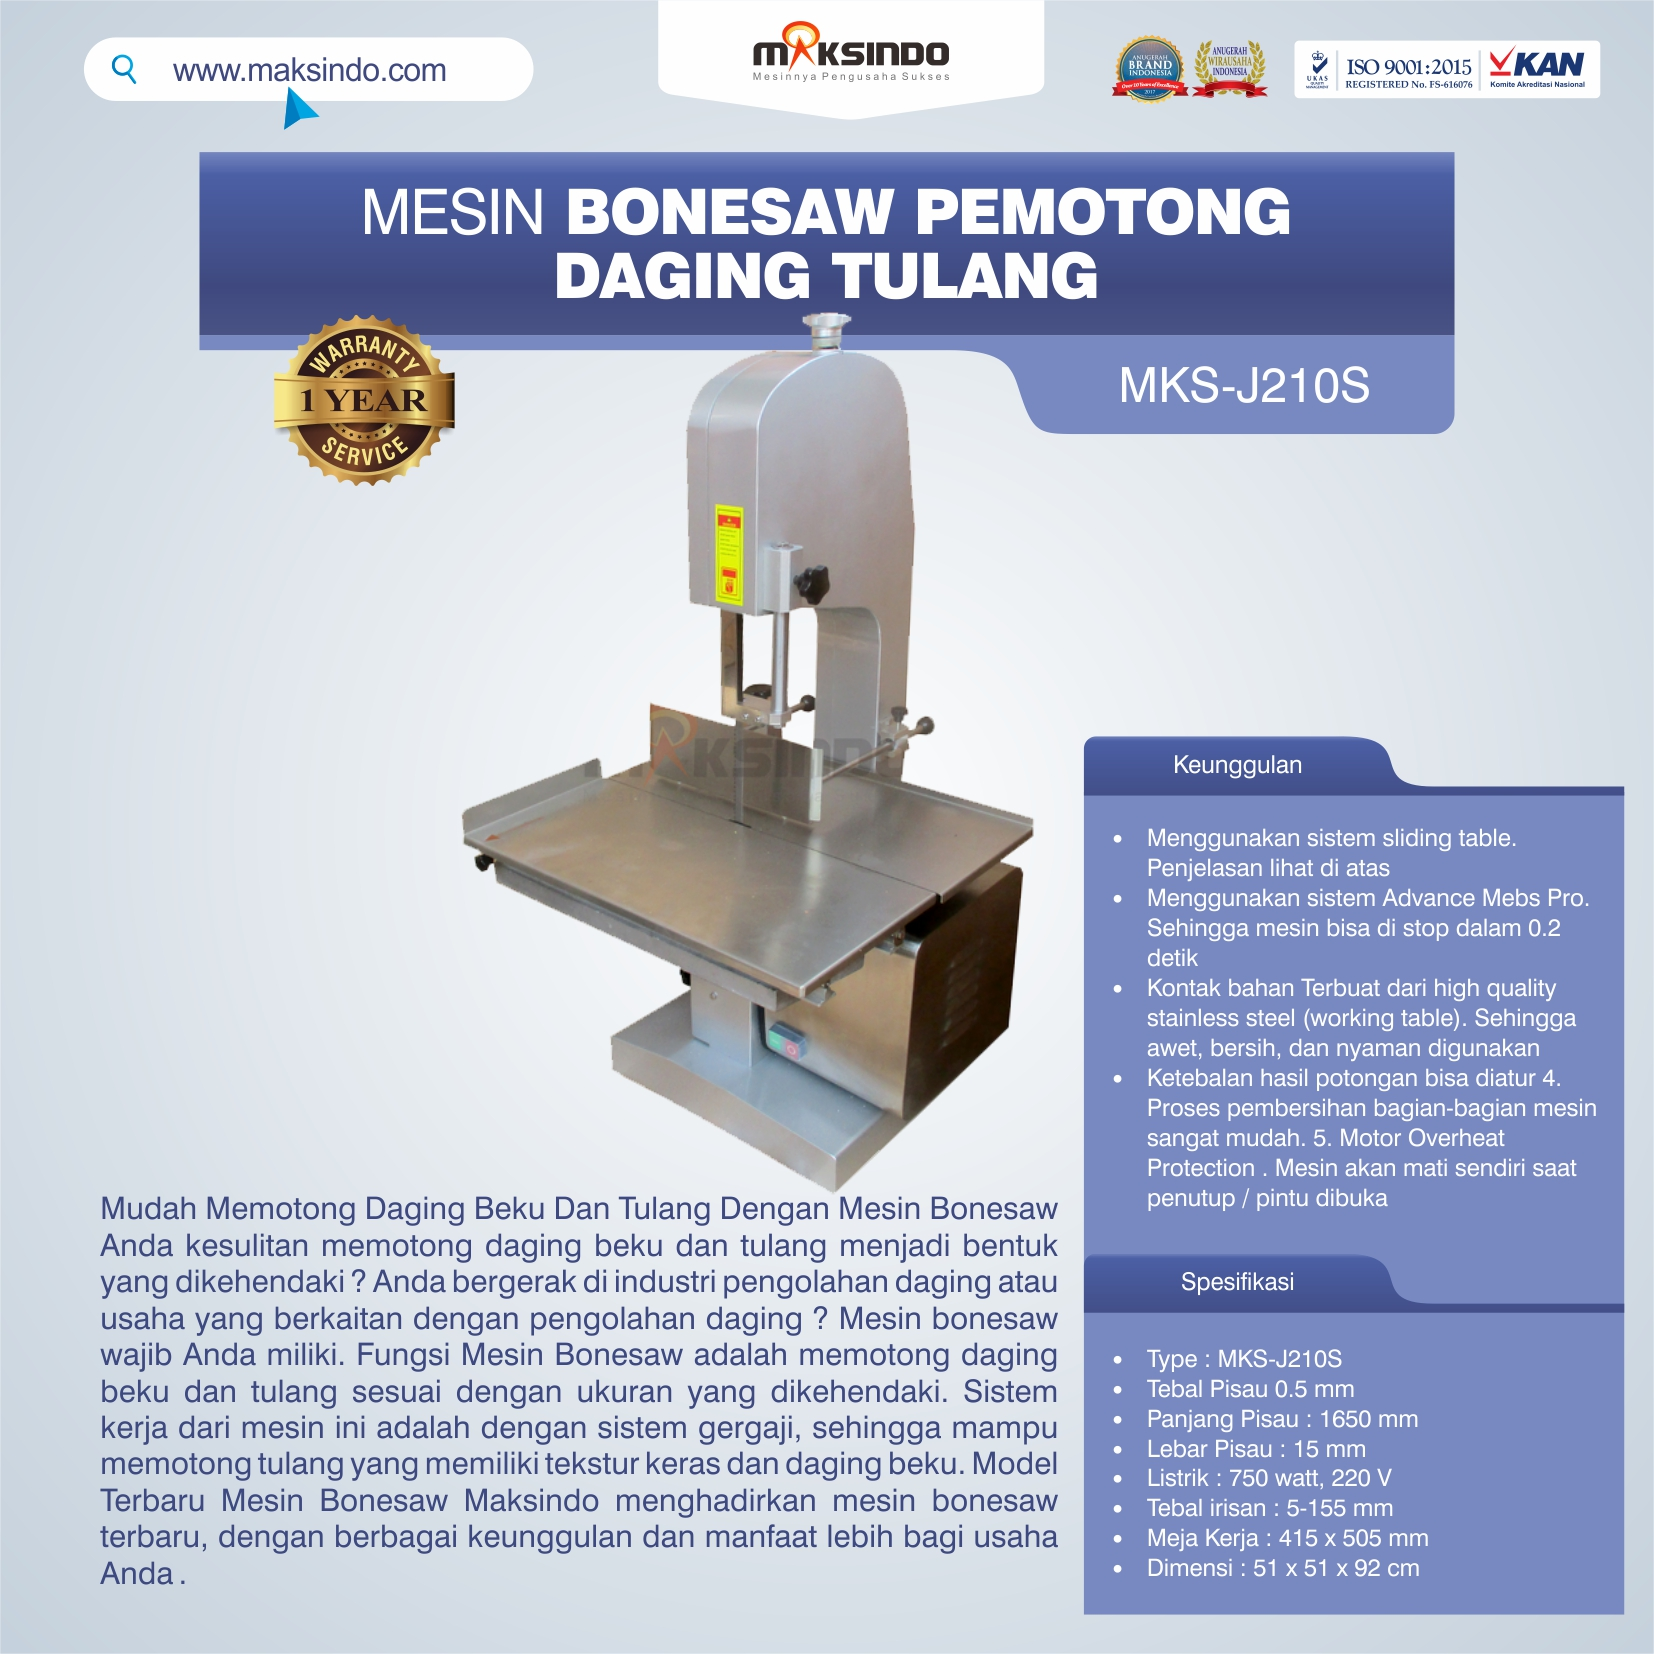 Jual Mesin Bonesaw Pemotong Daging Tulang (MKS-J210S) di Mataram